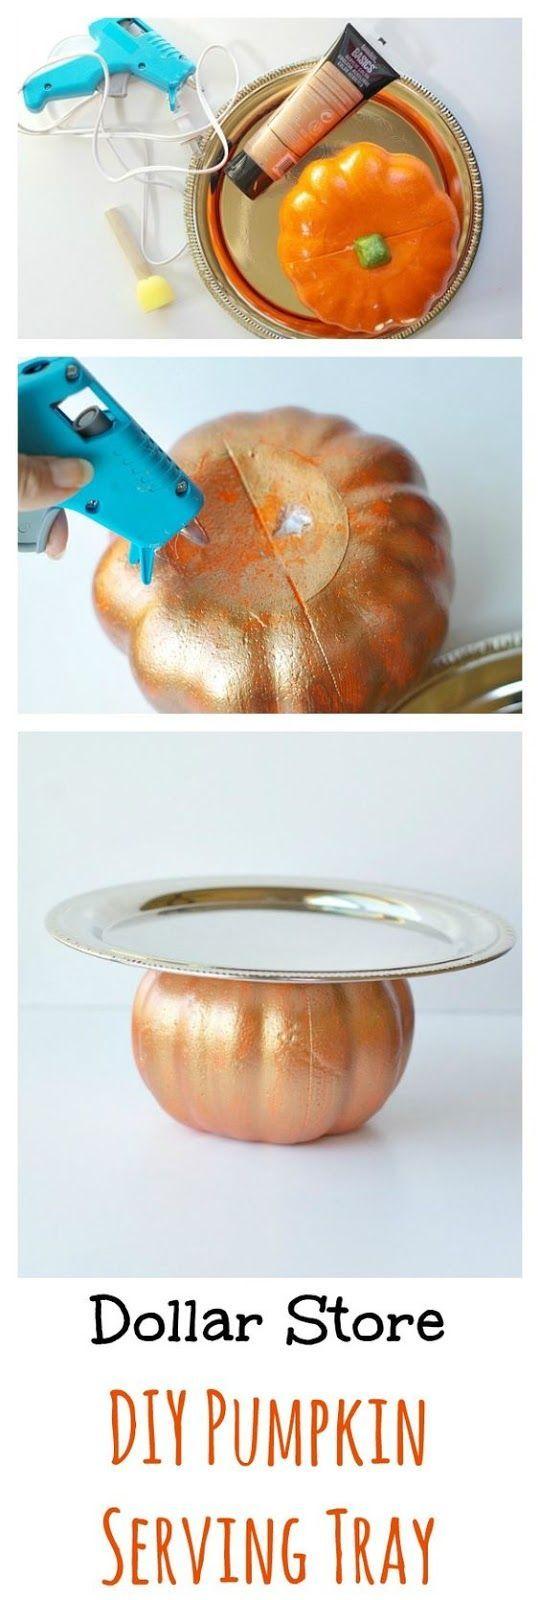 10 Thanksgiving Decorations DIY Ideas - #Decorations #DIY #Ideas #thanksgiving #thanksgivingdecorations